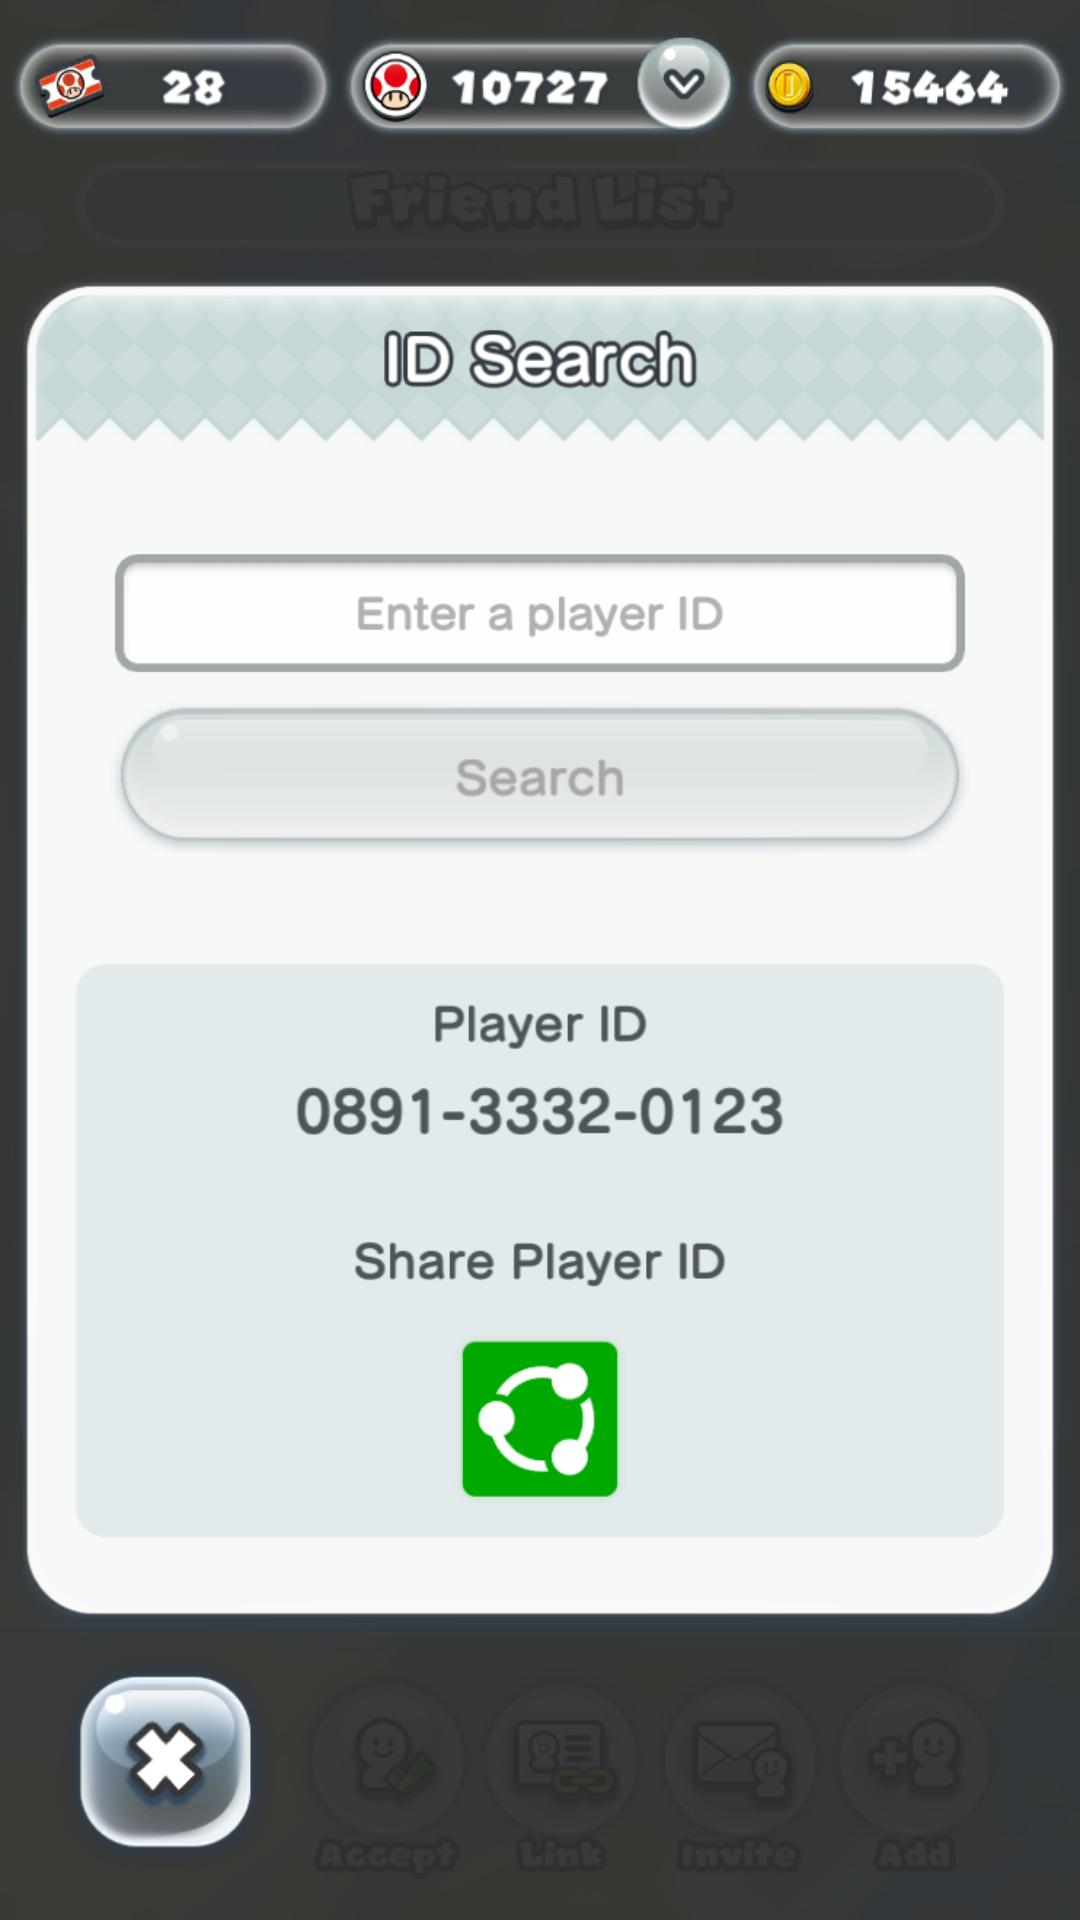 Player ID screen